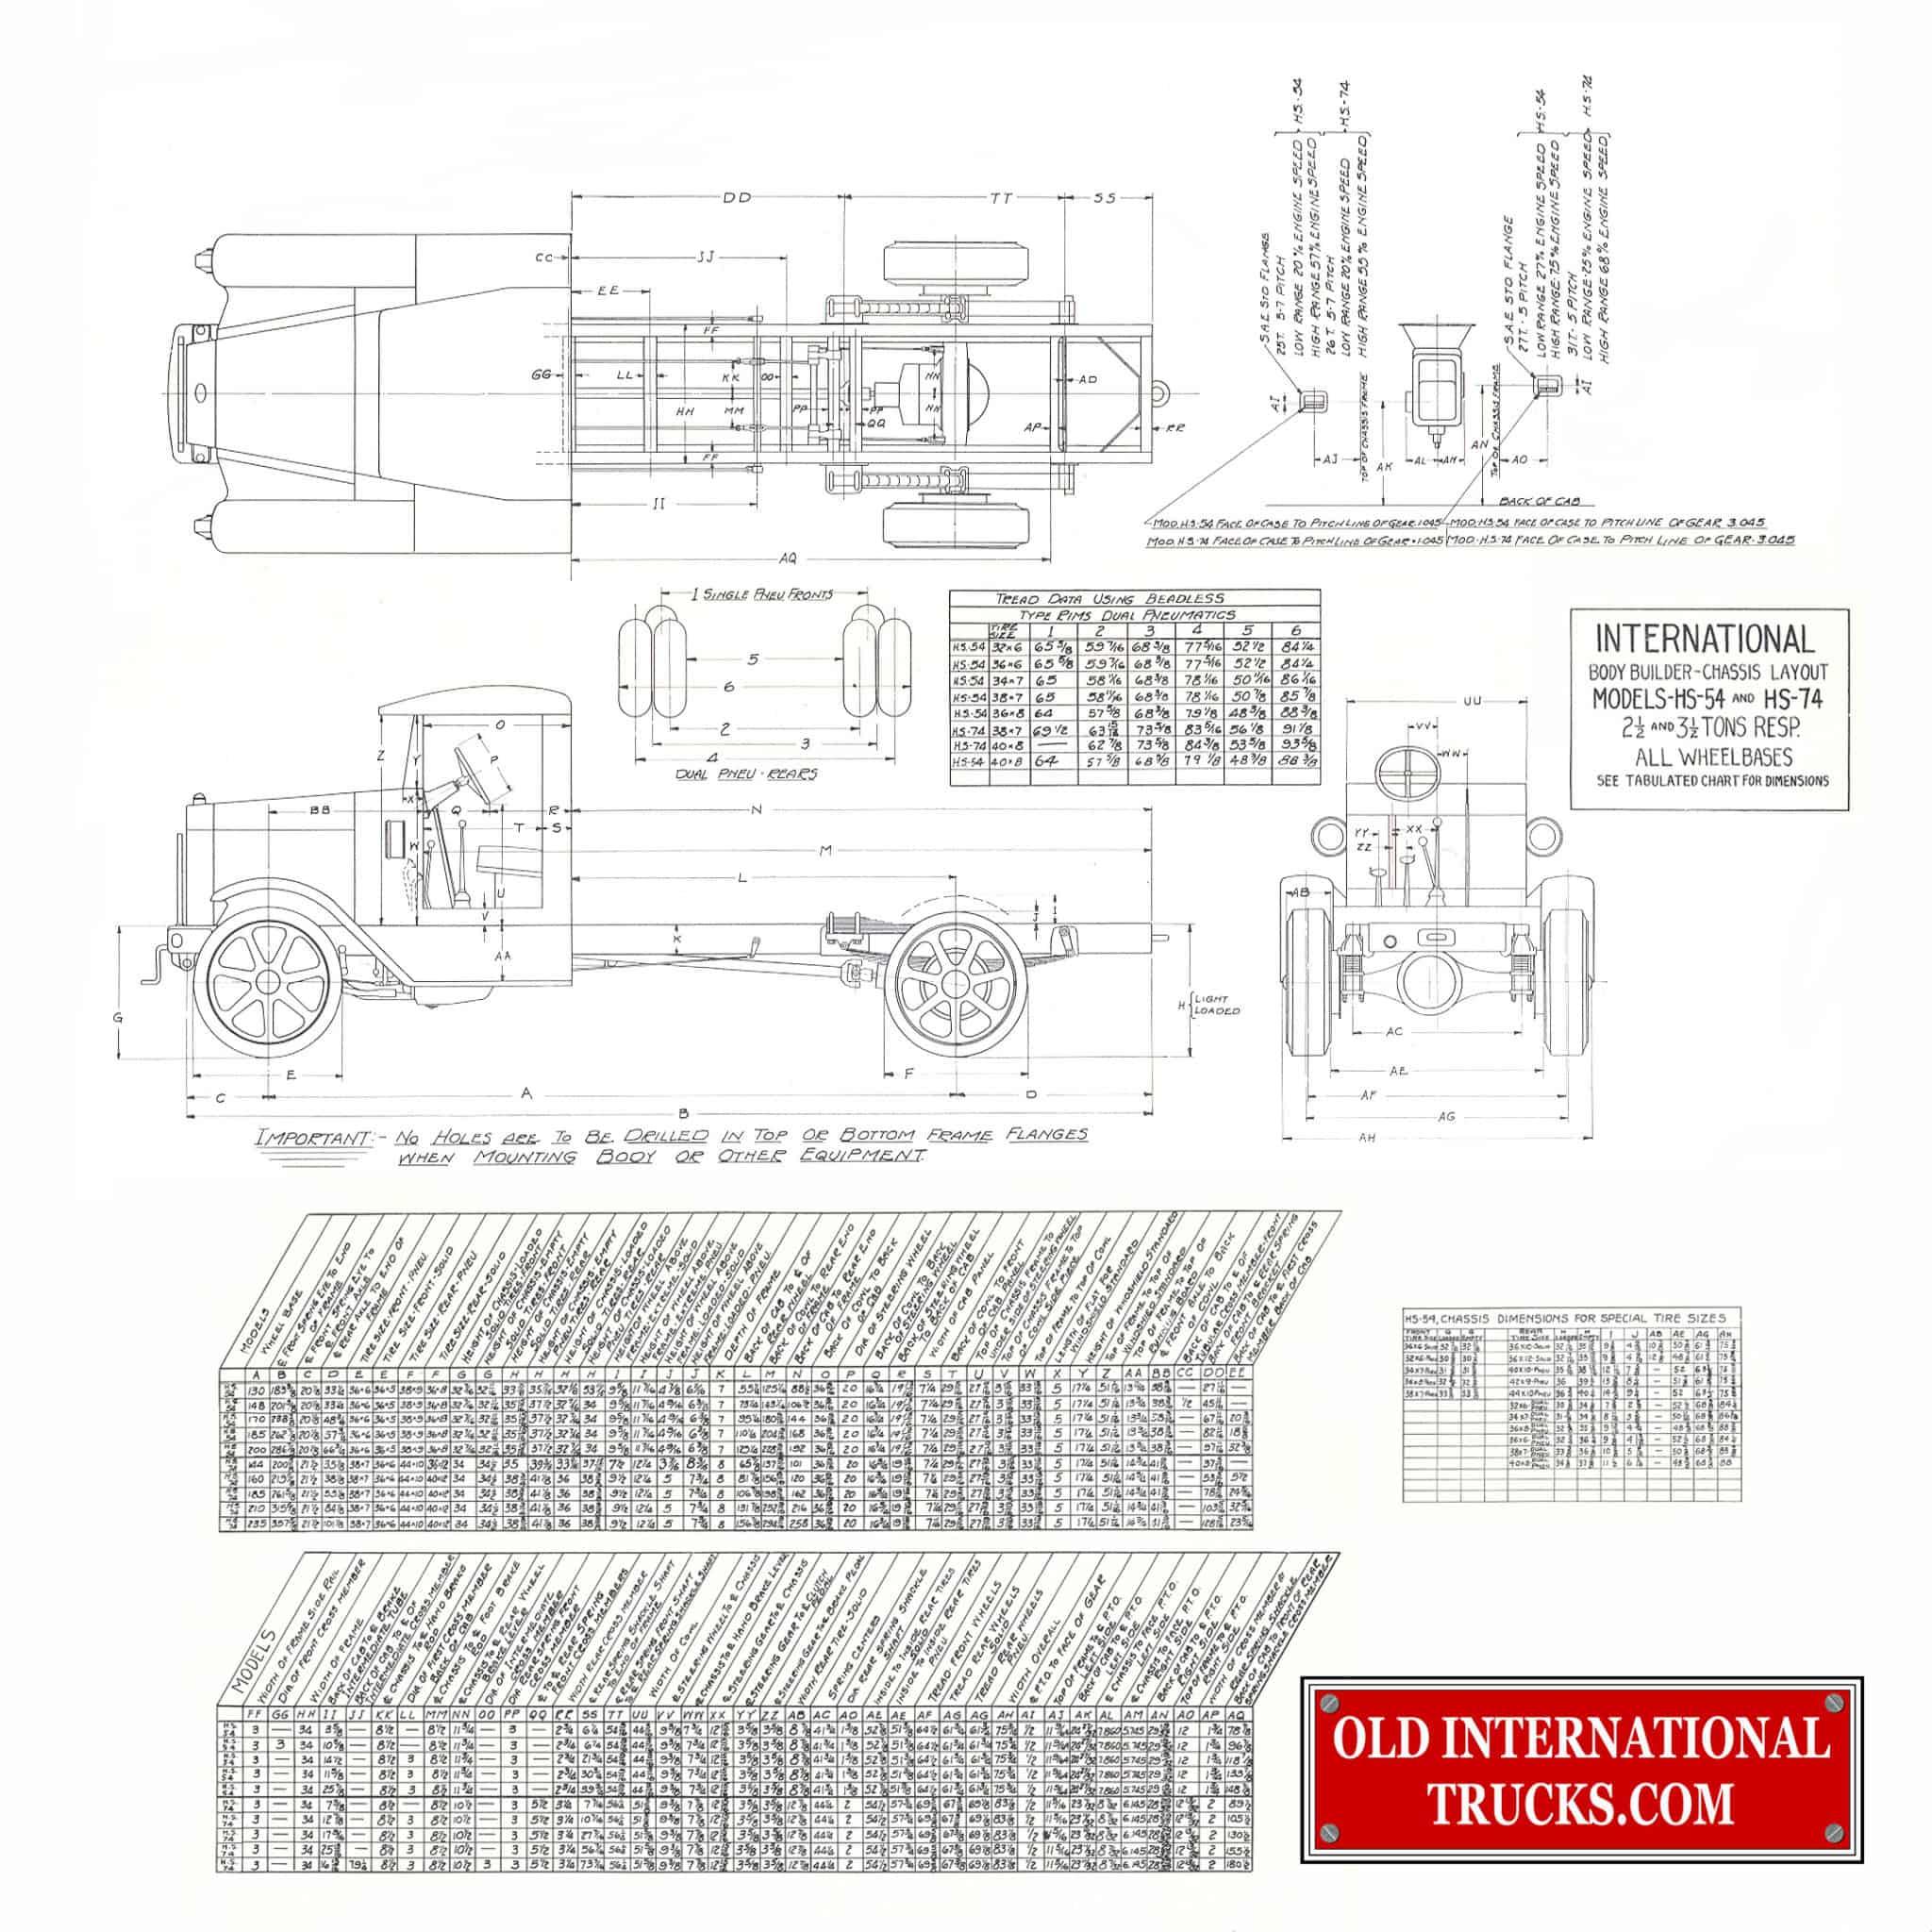 International Hs 54 Old International Truck Parts